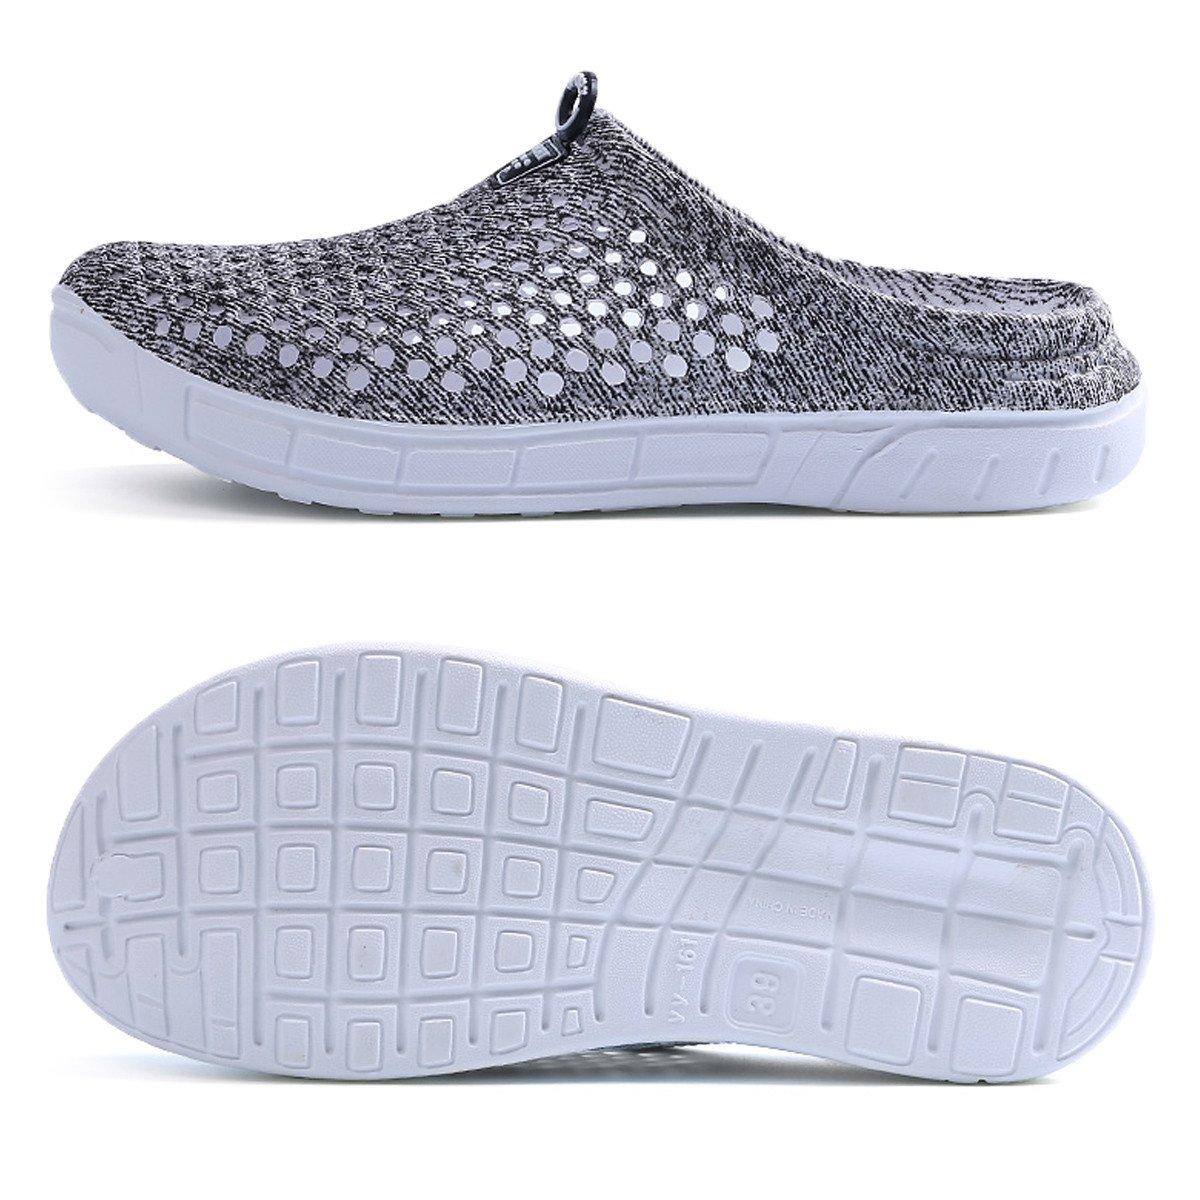 Ginjang Women's Garden Clogs Shoes Slip-on Slippers Sandals(38/Gray) by Ginjang (Image #2)